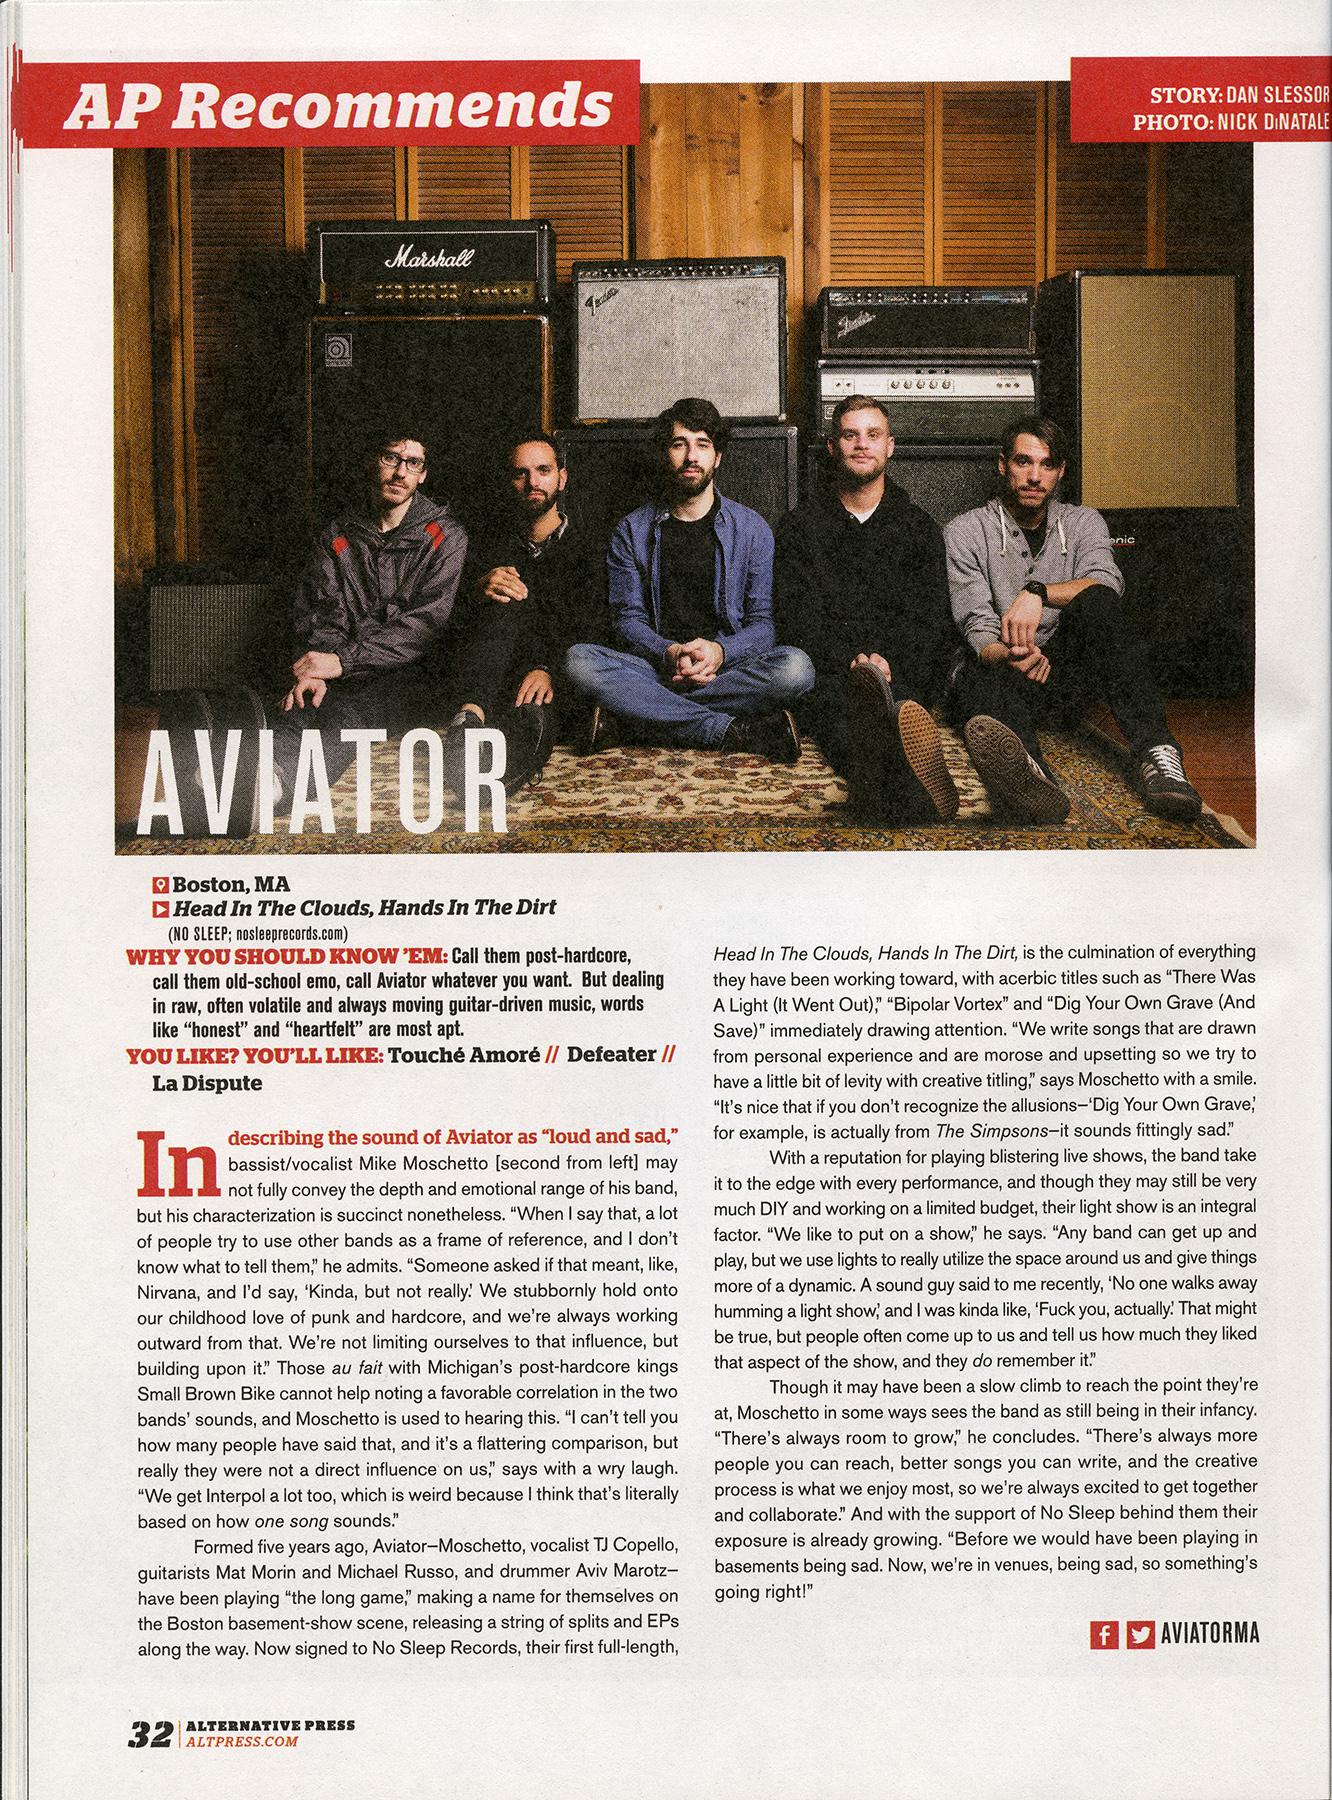 Alternative Press 319 - February, 2015  AP Recommends  Aviator, pg. 32